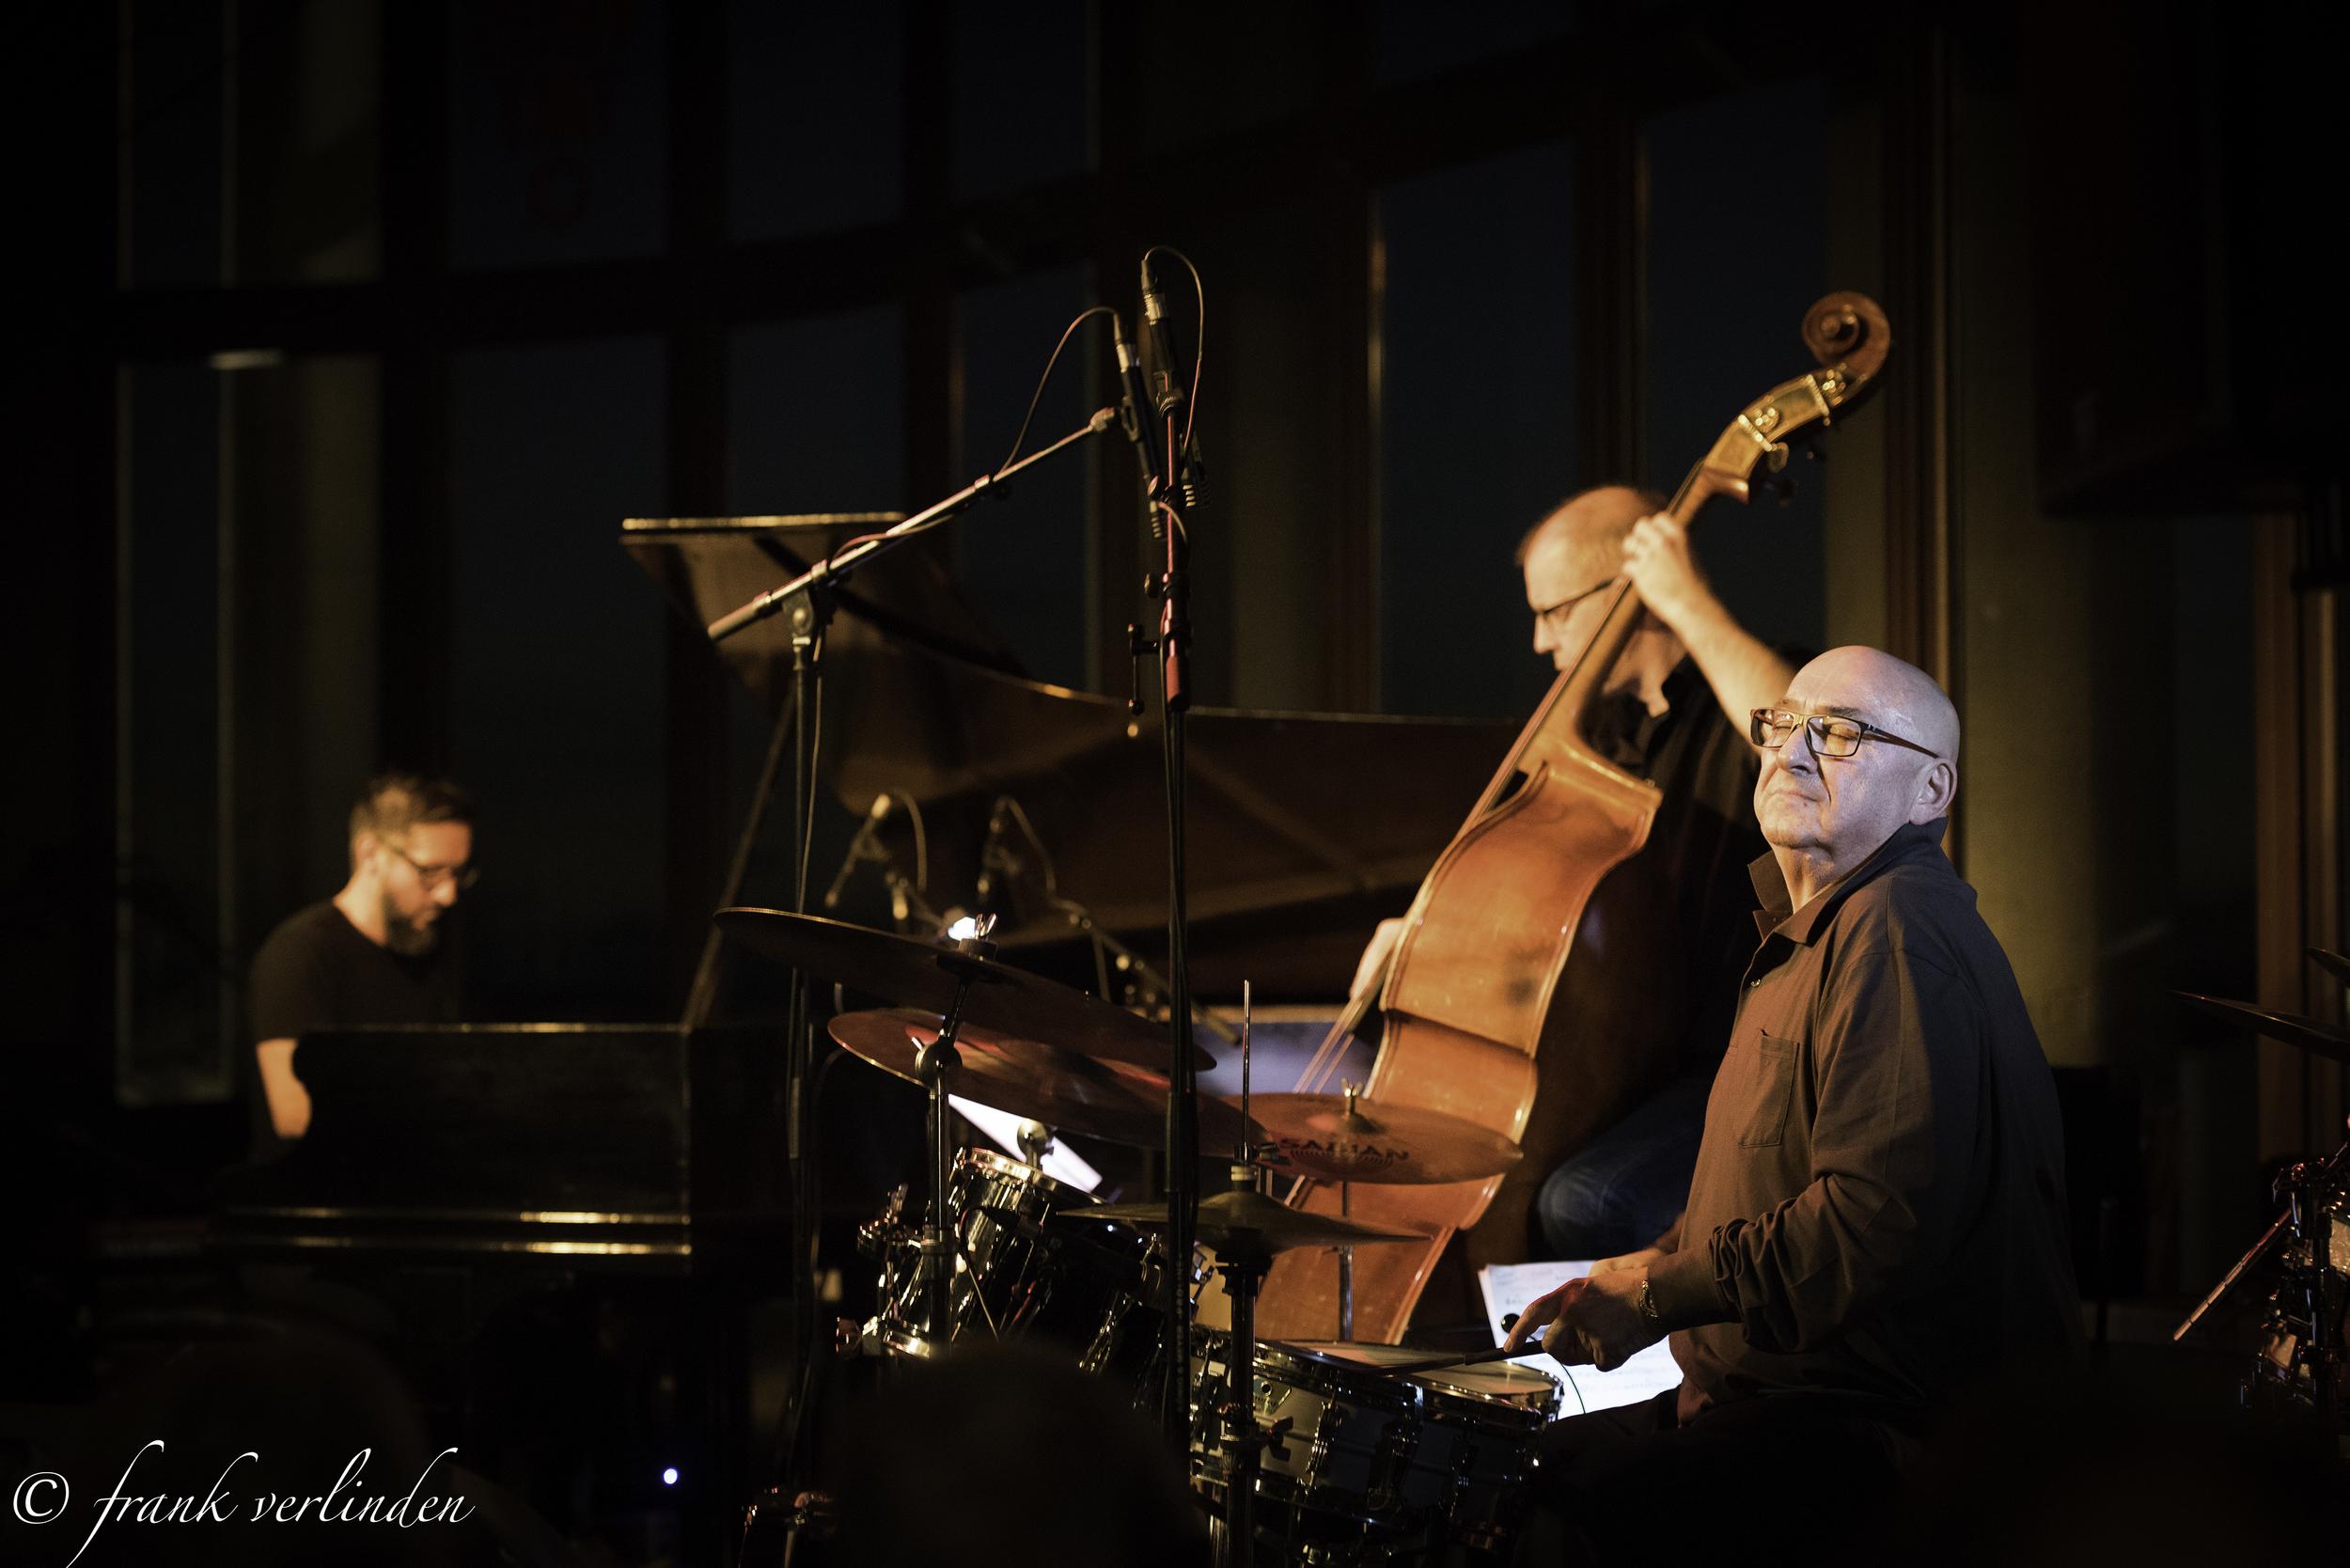 Bruno Castellucci, Bas Bulteel Trio @ Vrijstaat O, Ostend